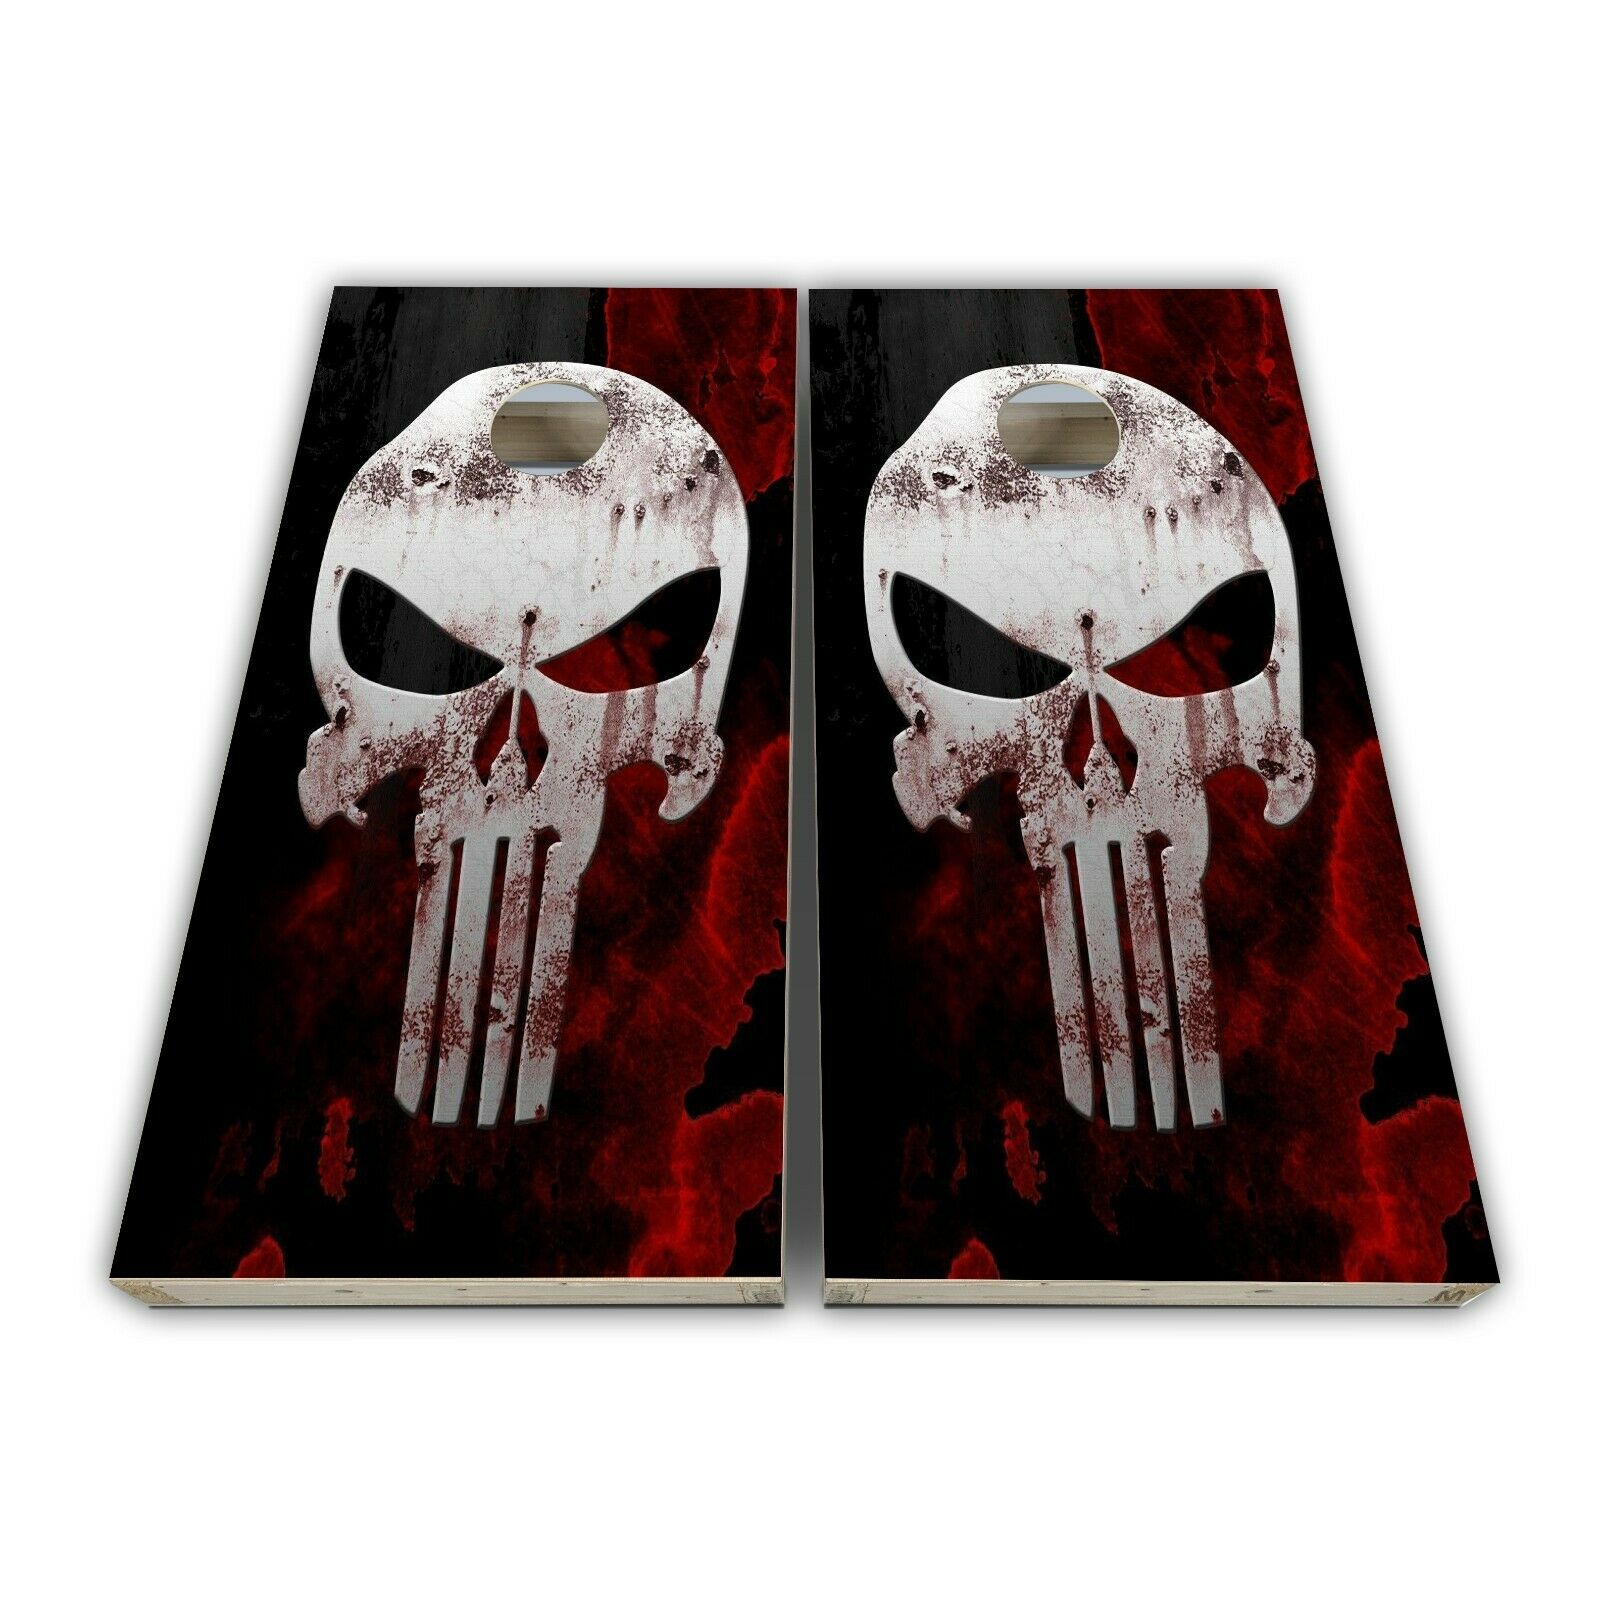 Skull Cornhole Decal Laminated  3M Vinyl Cornhole Wrap SET  save 60% discount and fast shipping worldwide